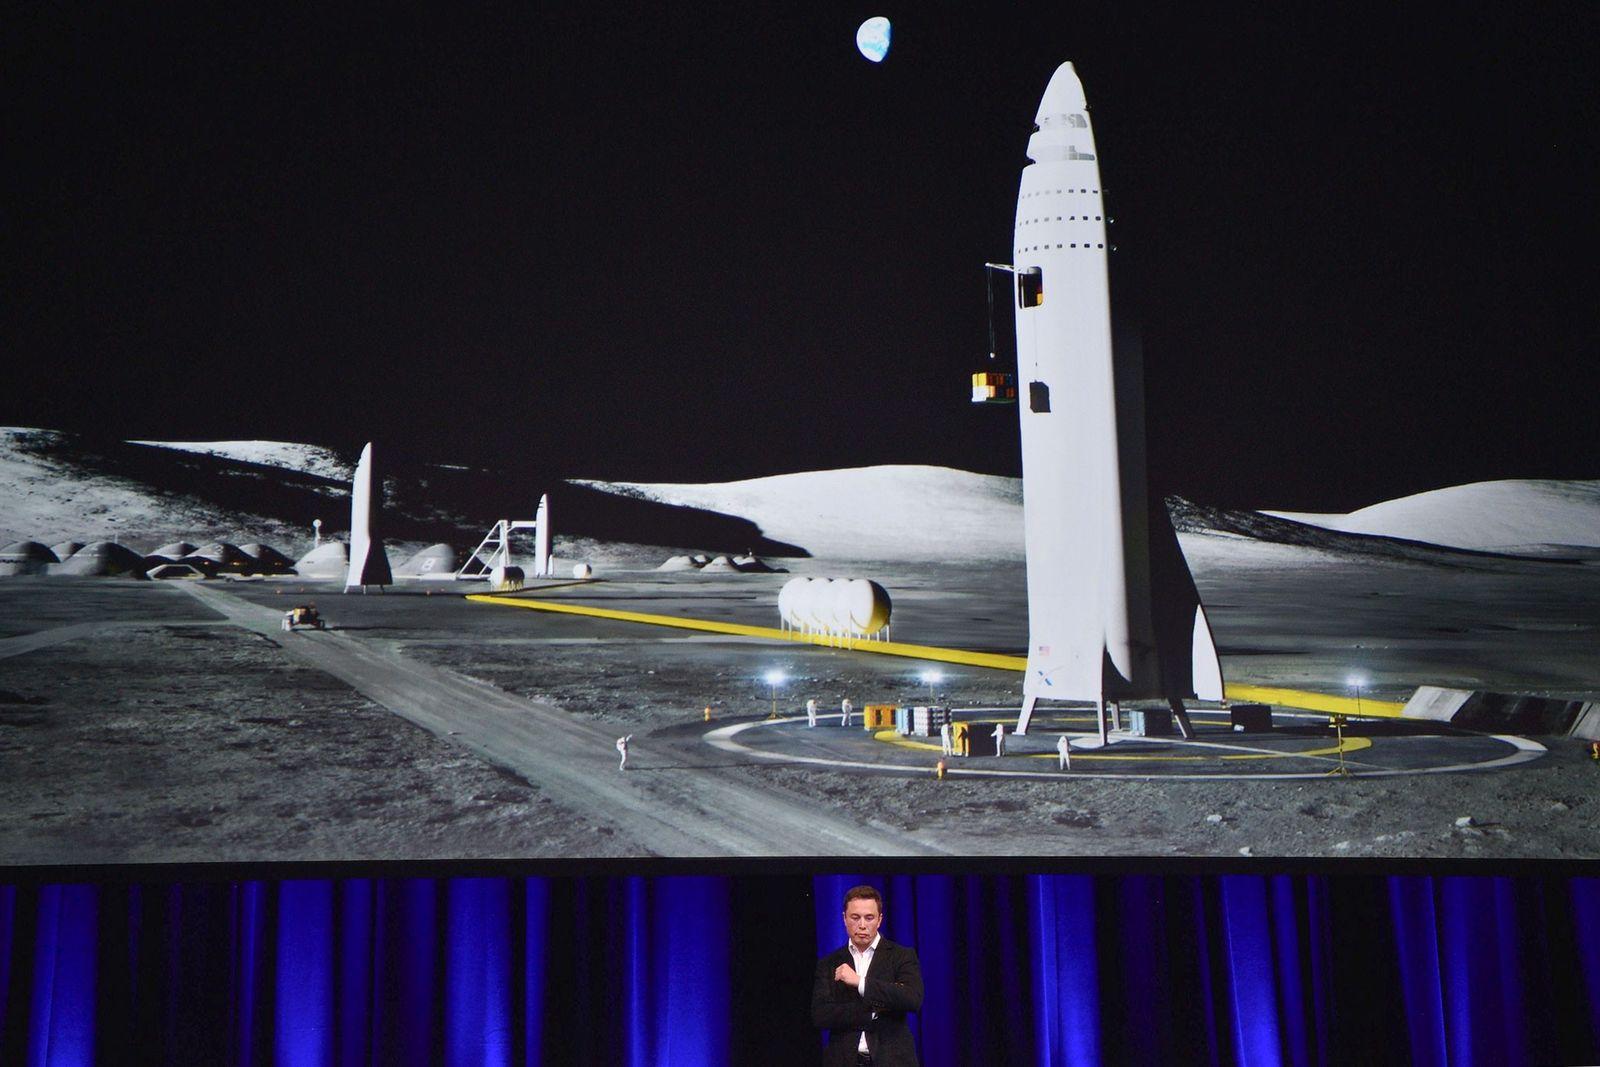 Elon Musk, fundador de SpaceX